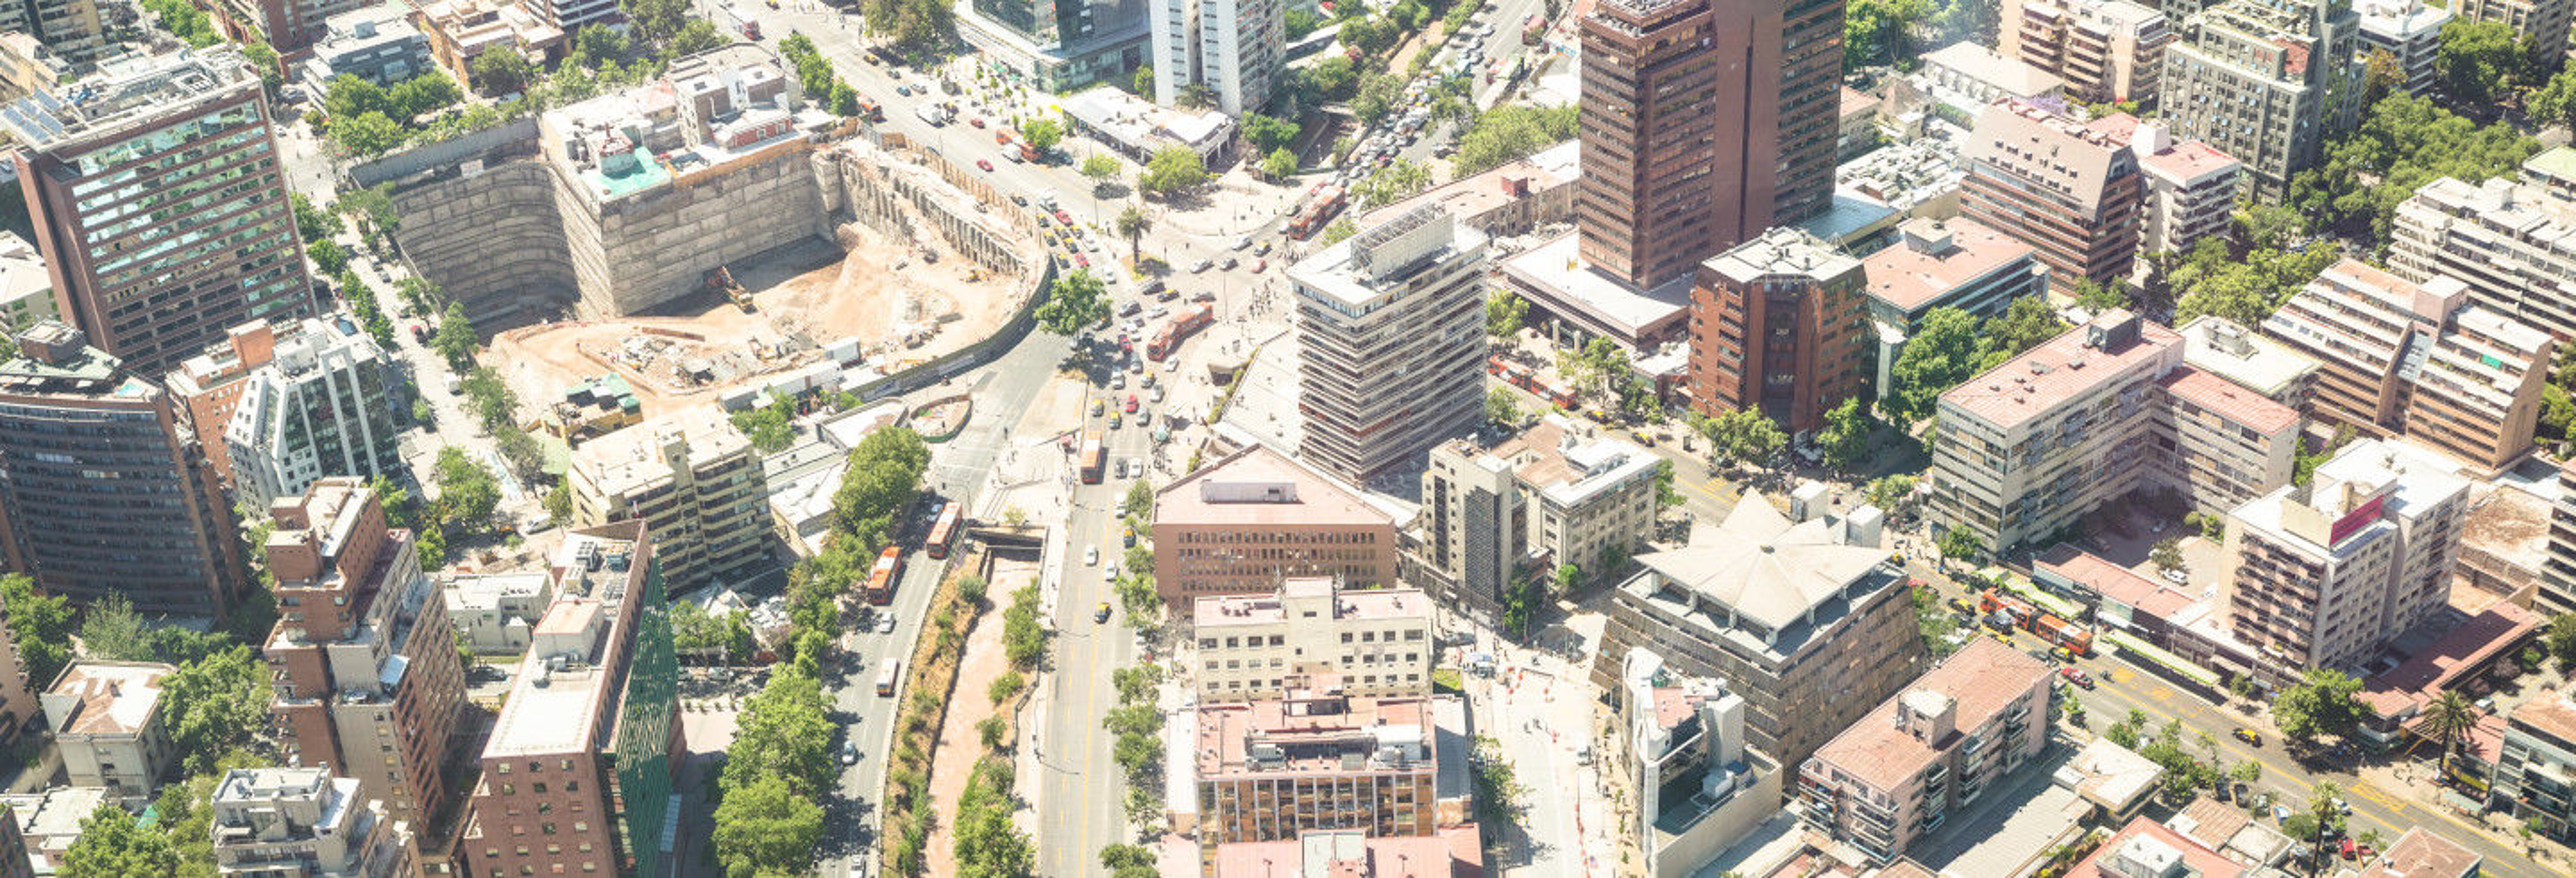 Paseo en helicóptero por Santiago de Chile